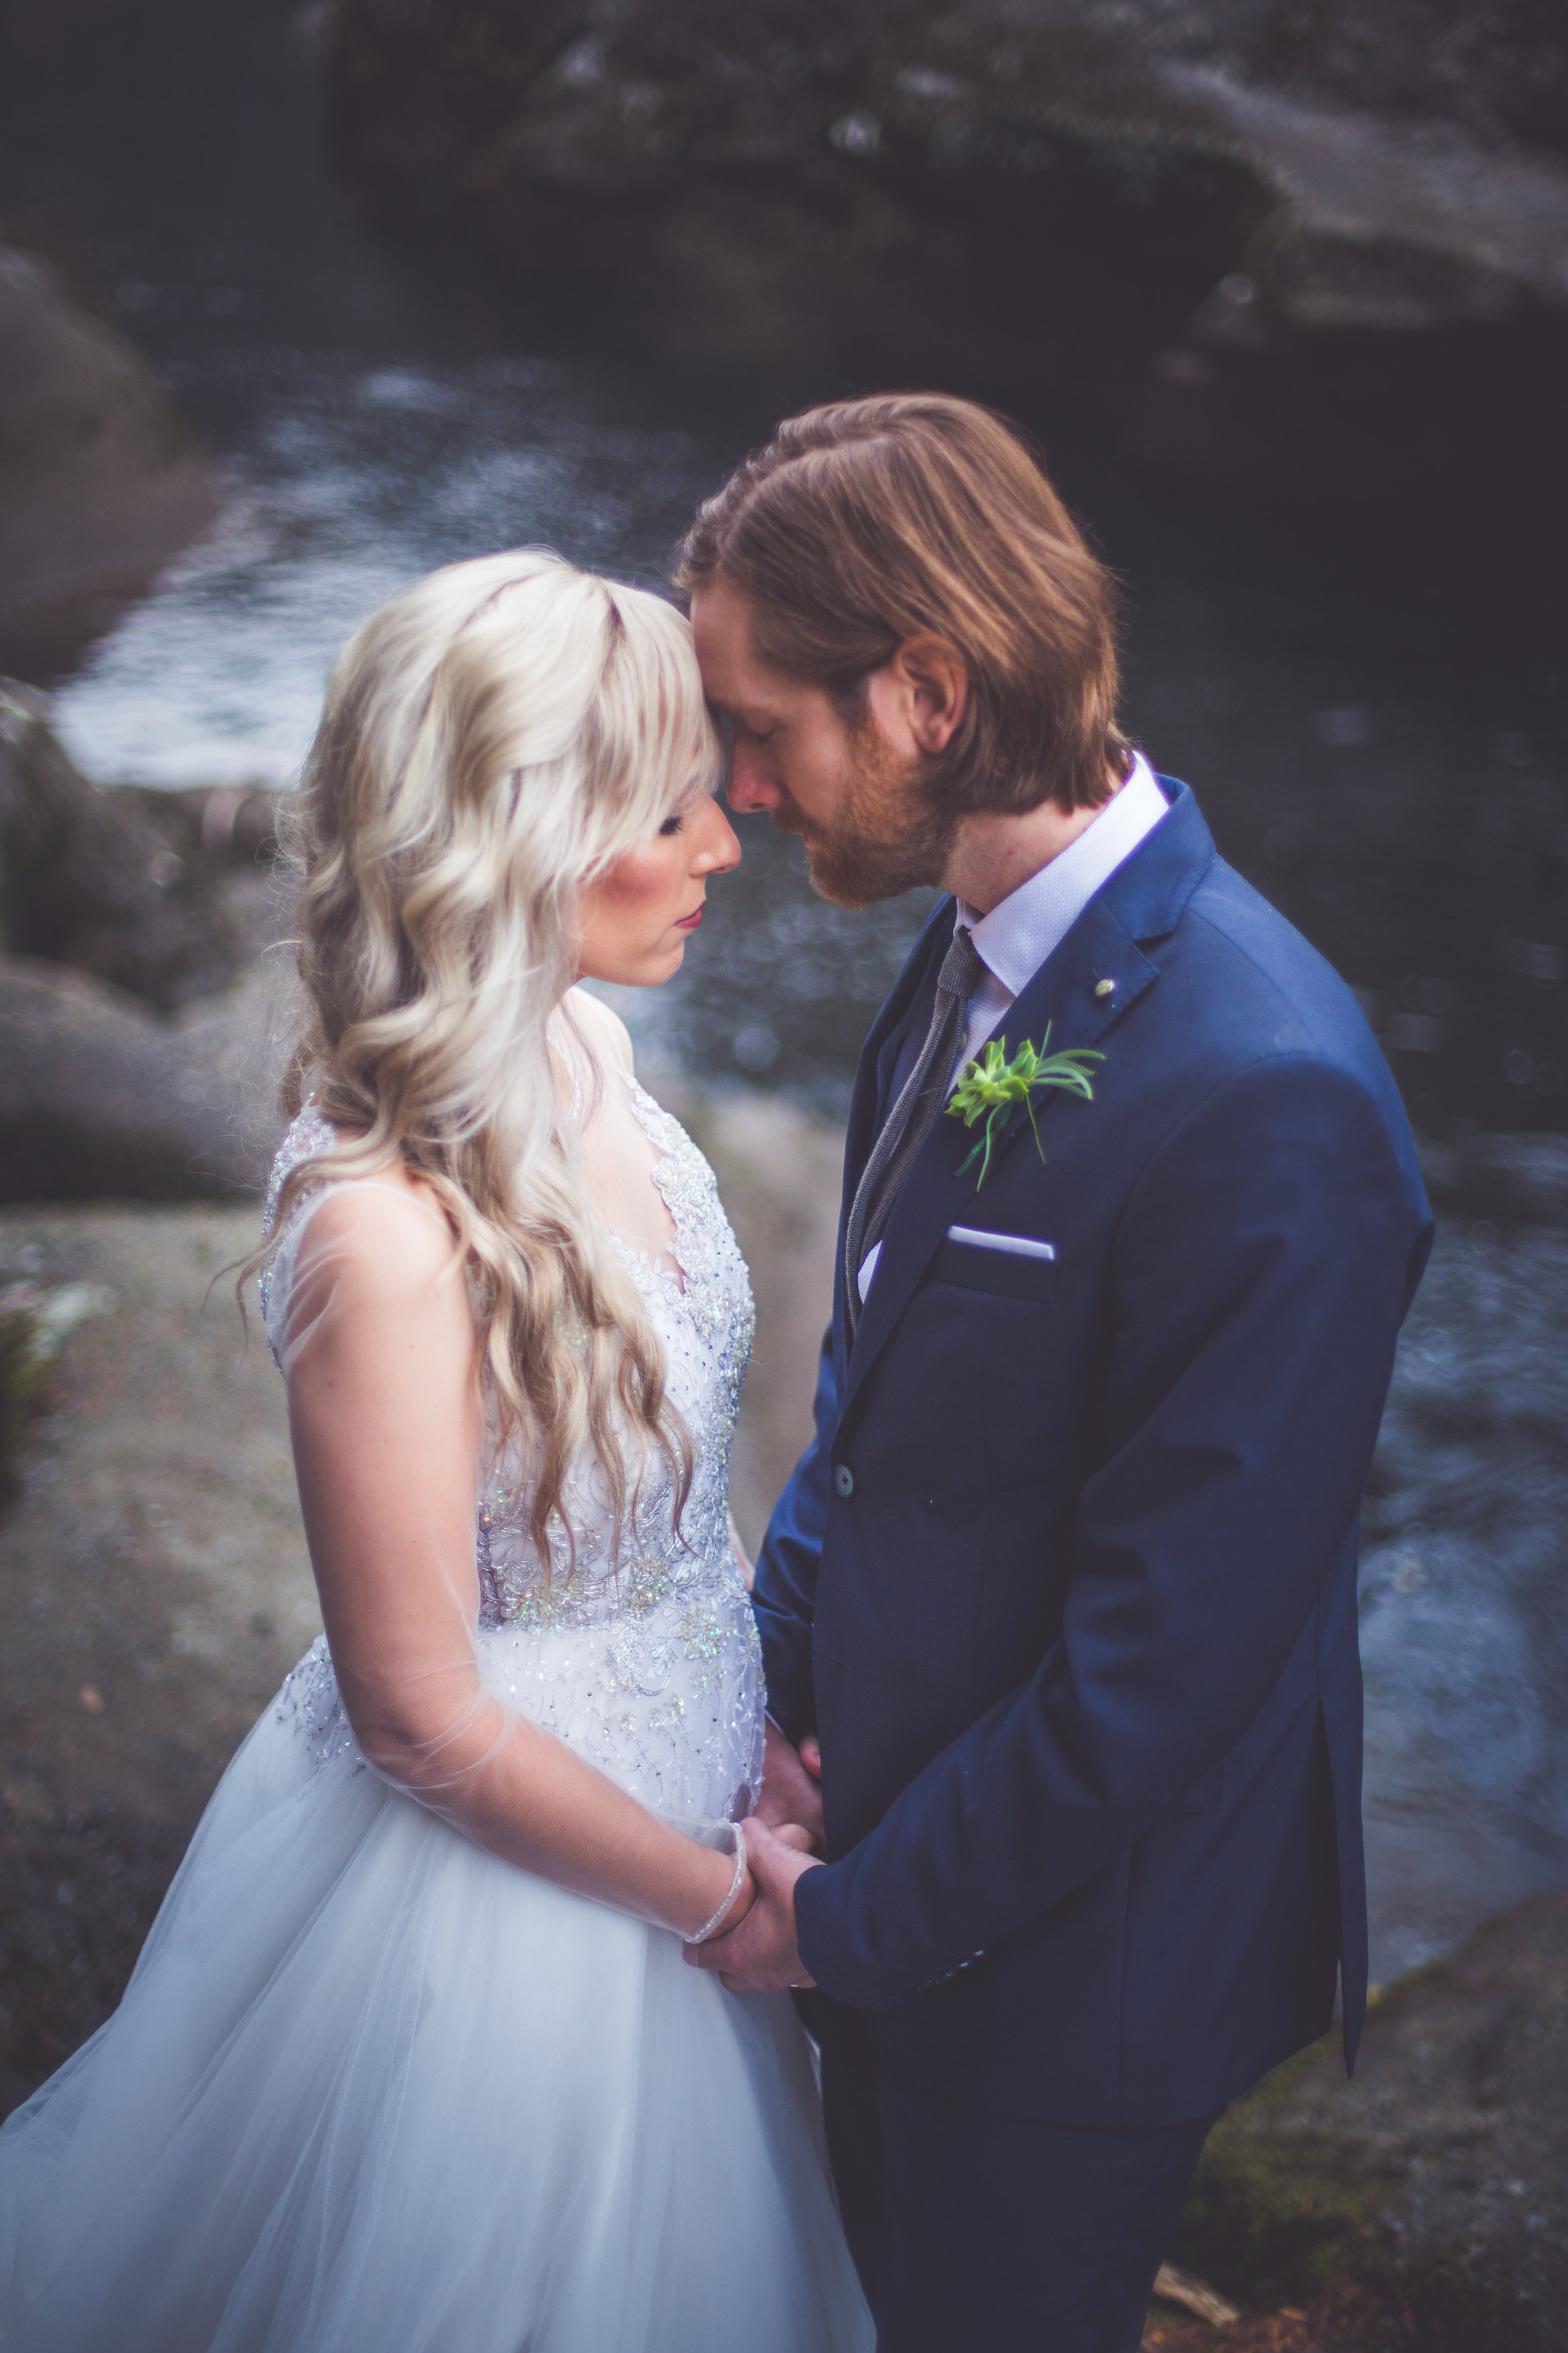 whimsical-romantic-wedding-top-bridge-5.jpg